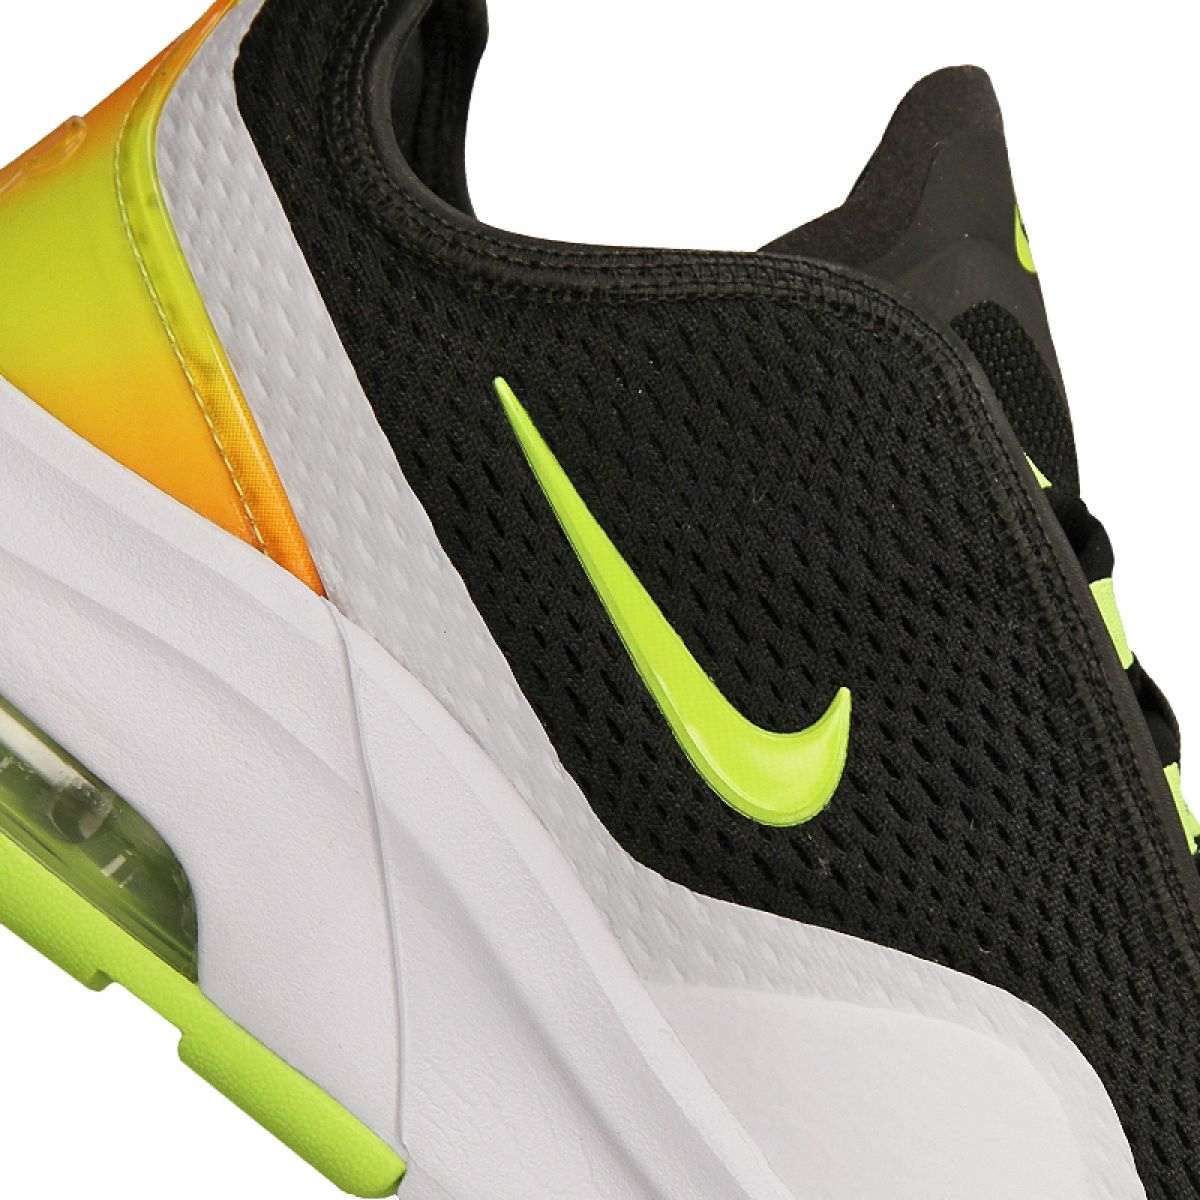 Zapatillas Nike Air Max Motion 2 M AO0266 007 negro